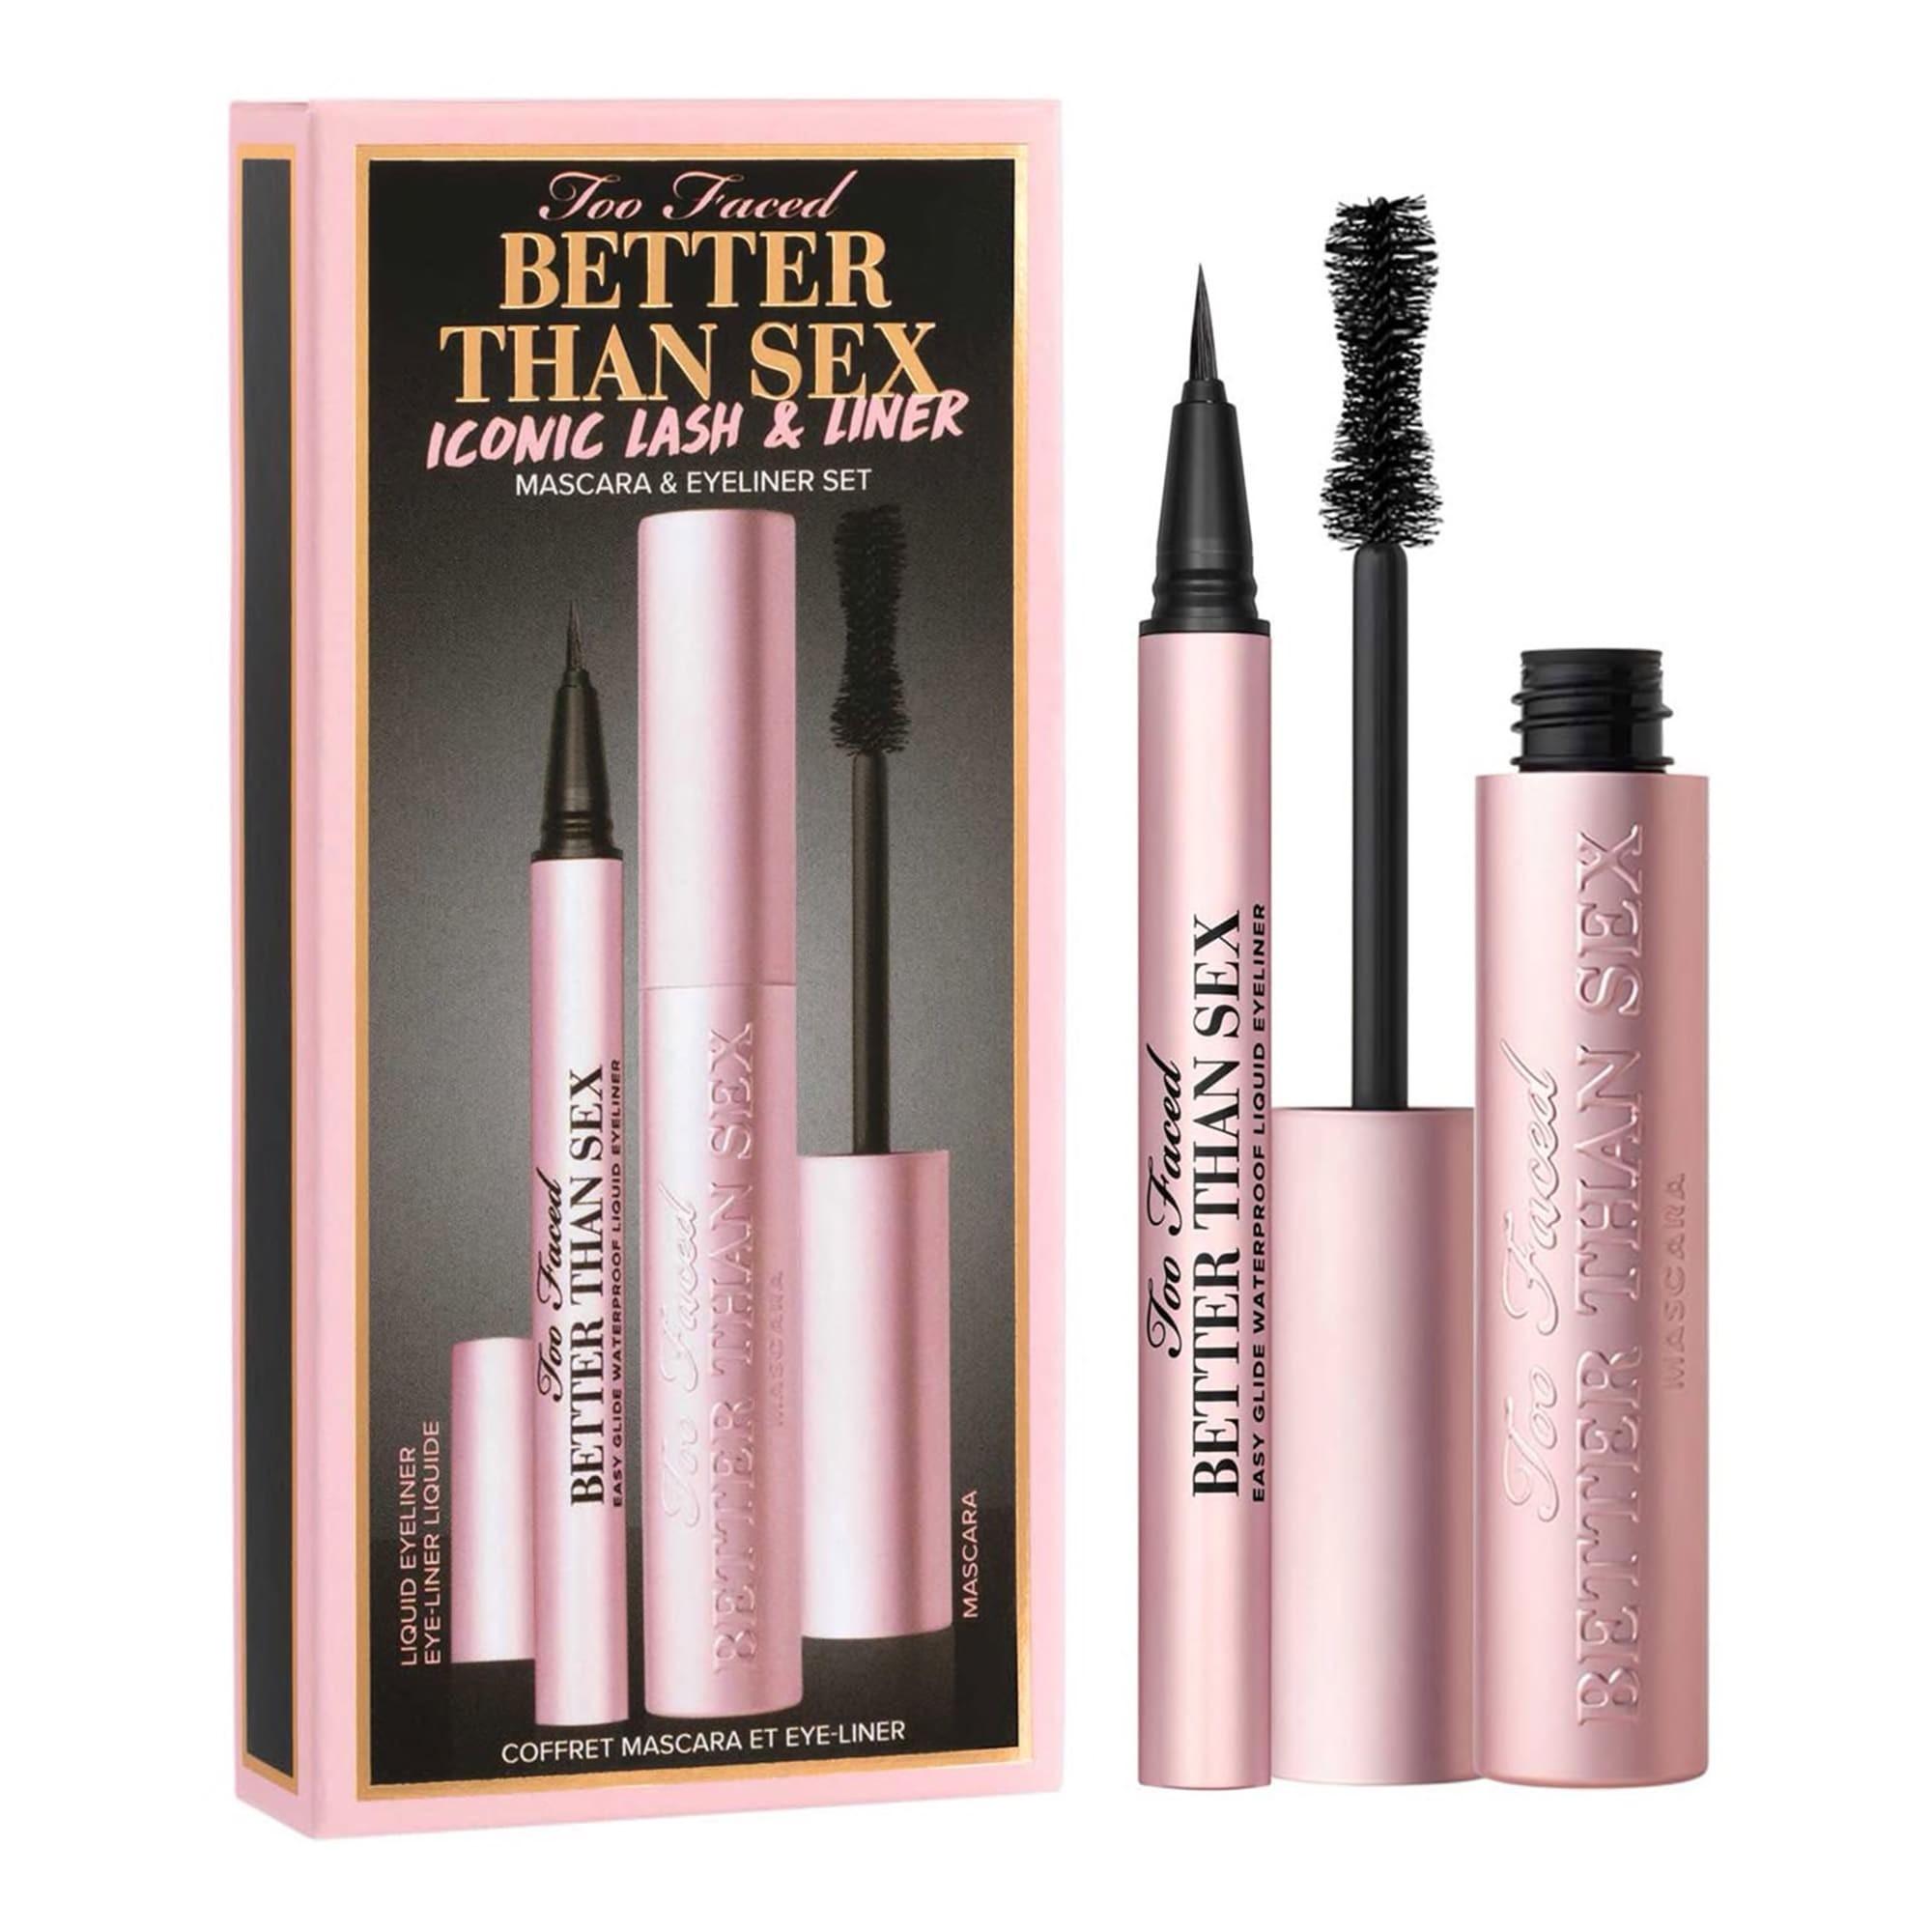 Set de maquillaje para ojos y pestañas Better than Sex de Too Faced